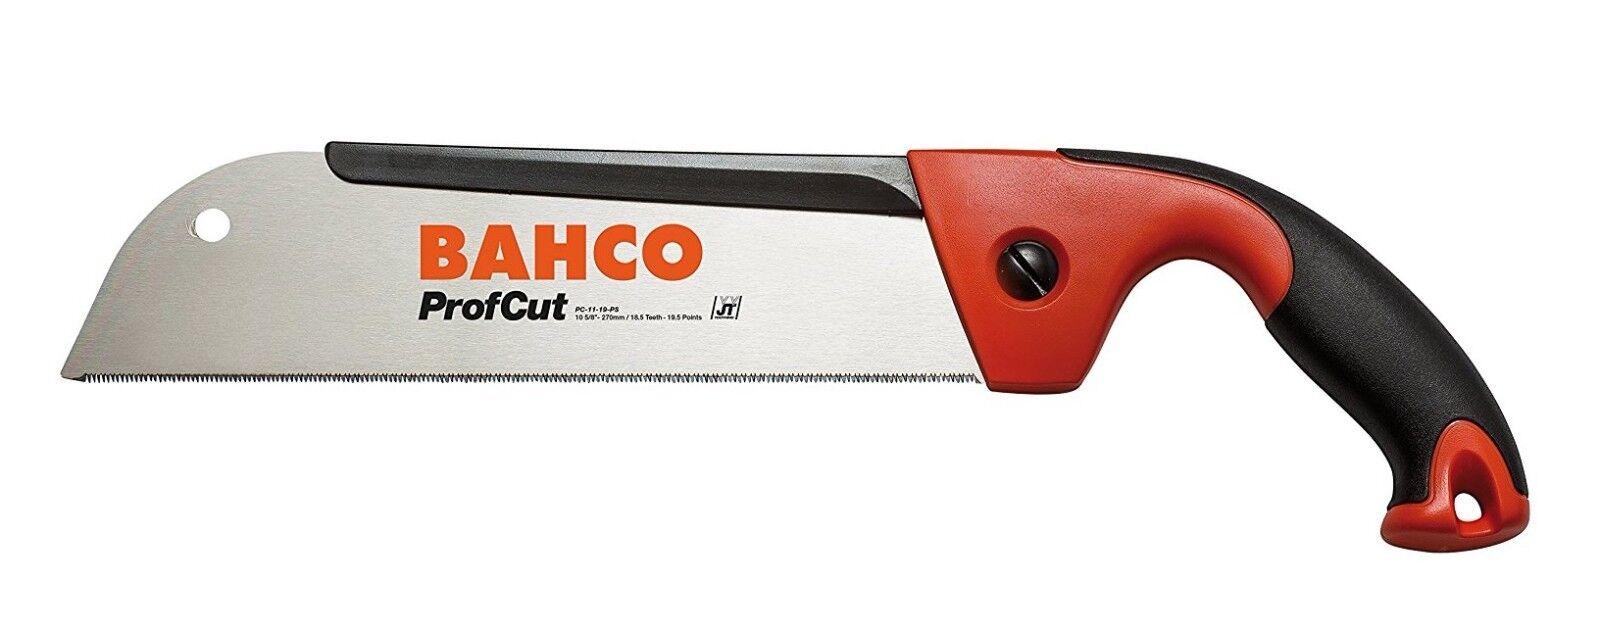 BAHCO / CUT SAW BLADE 270mm / PC-11-19-PC